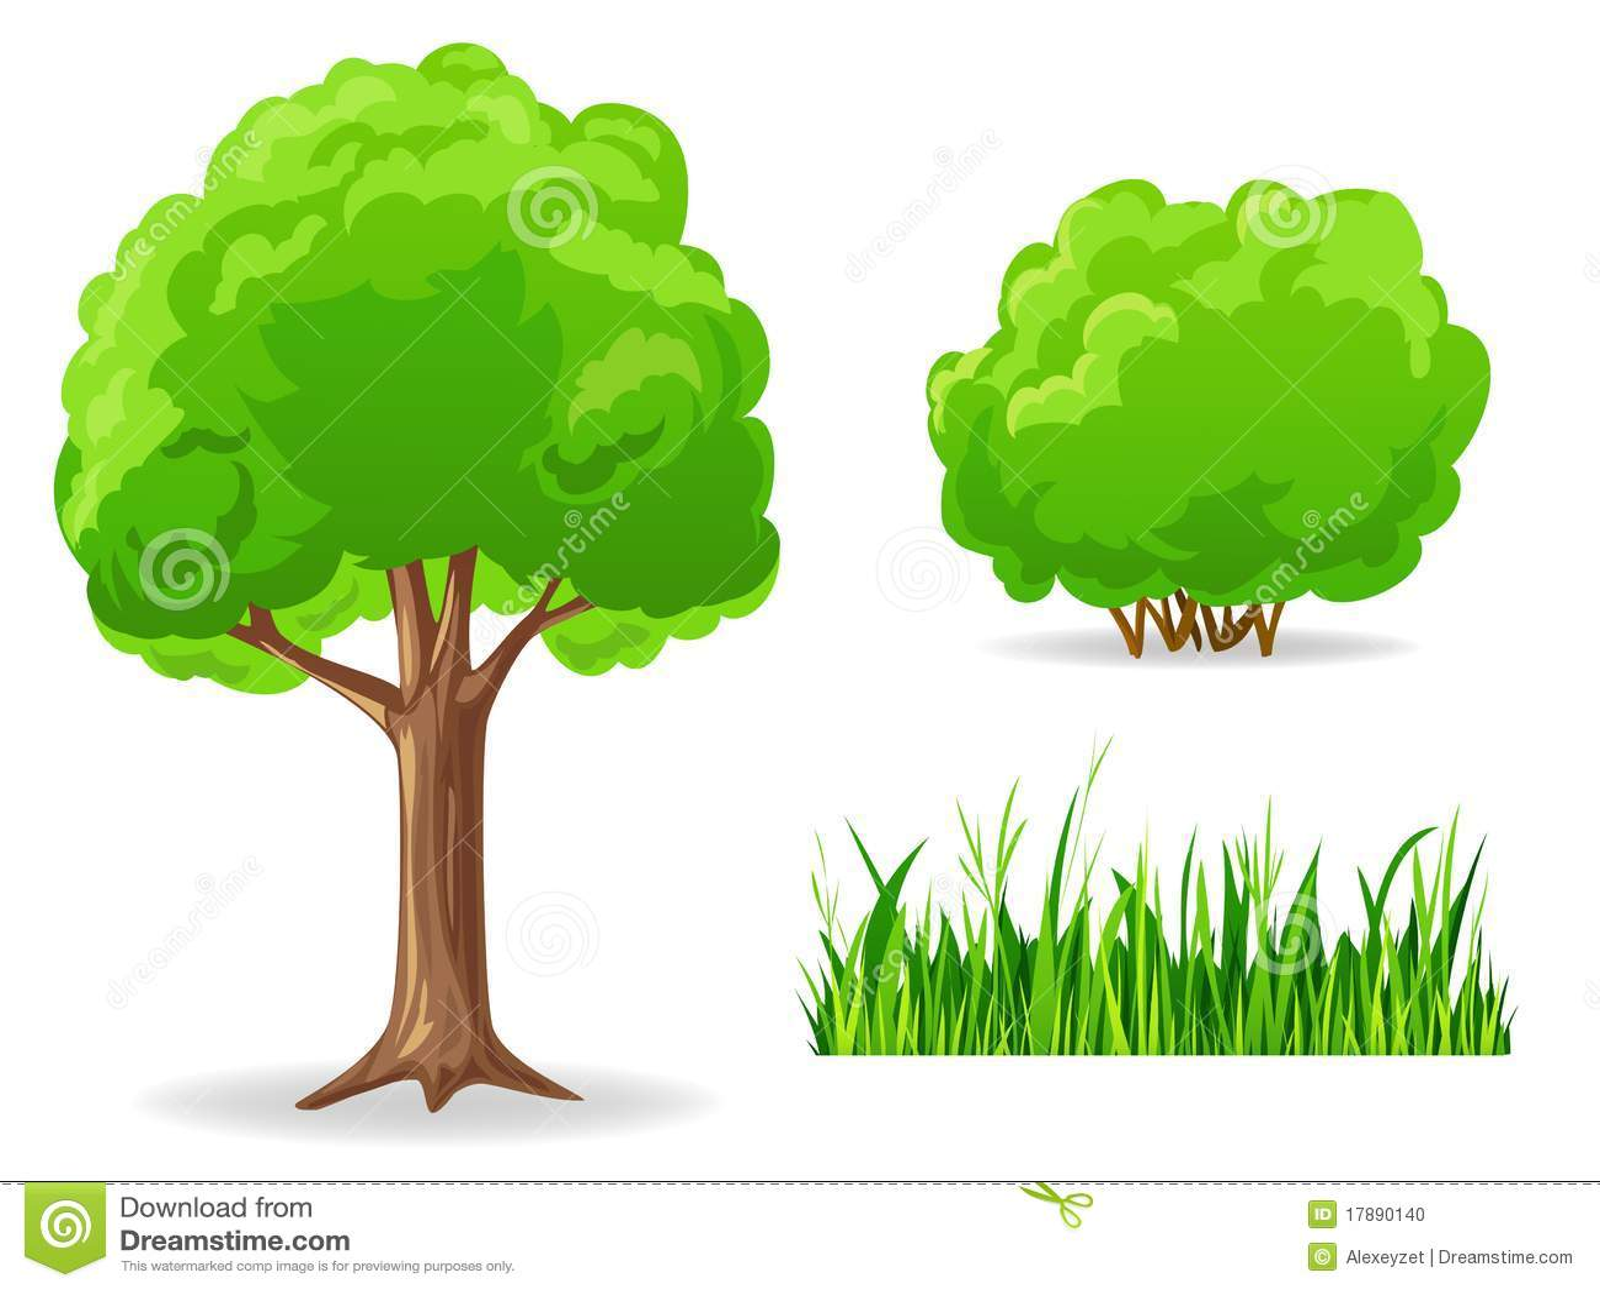 Set Of Cartoon Green Plants. Tree, Bush, Grass. Stock